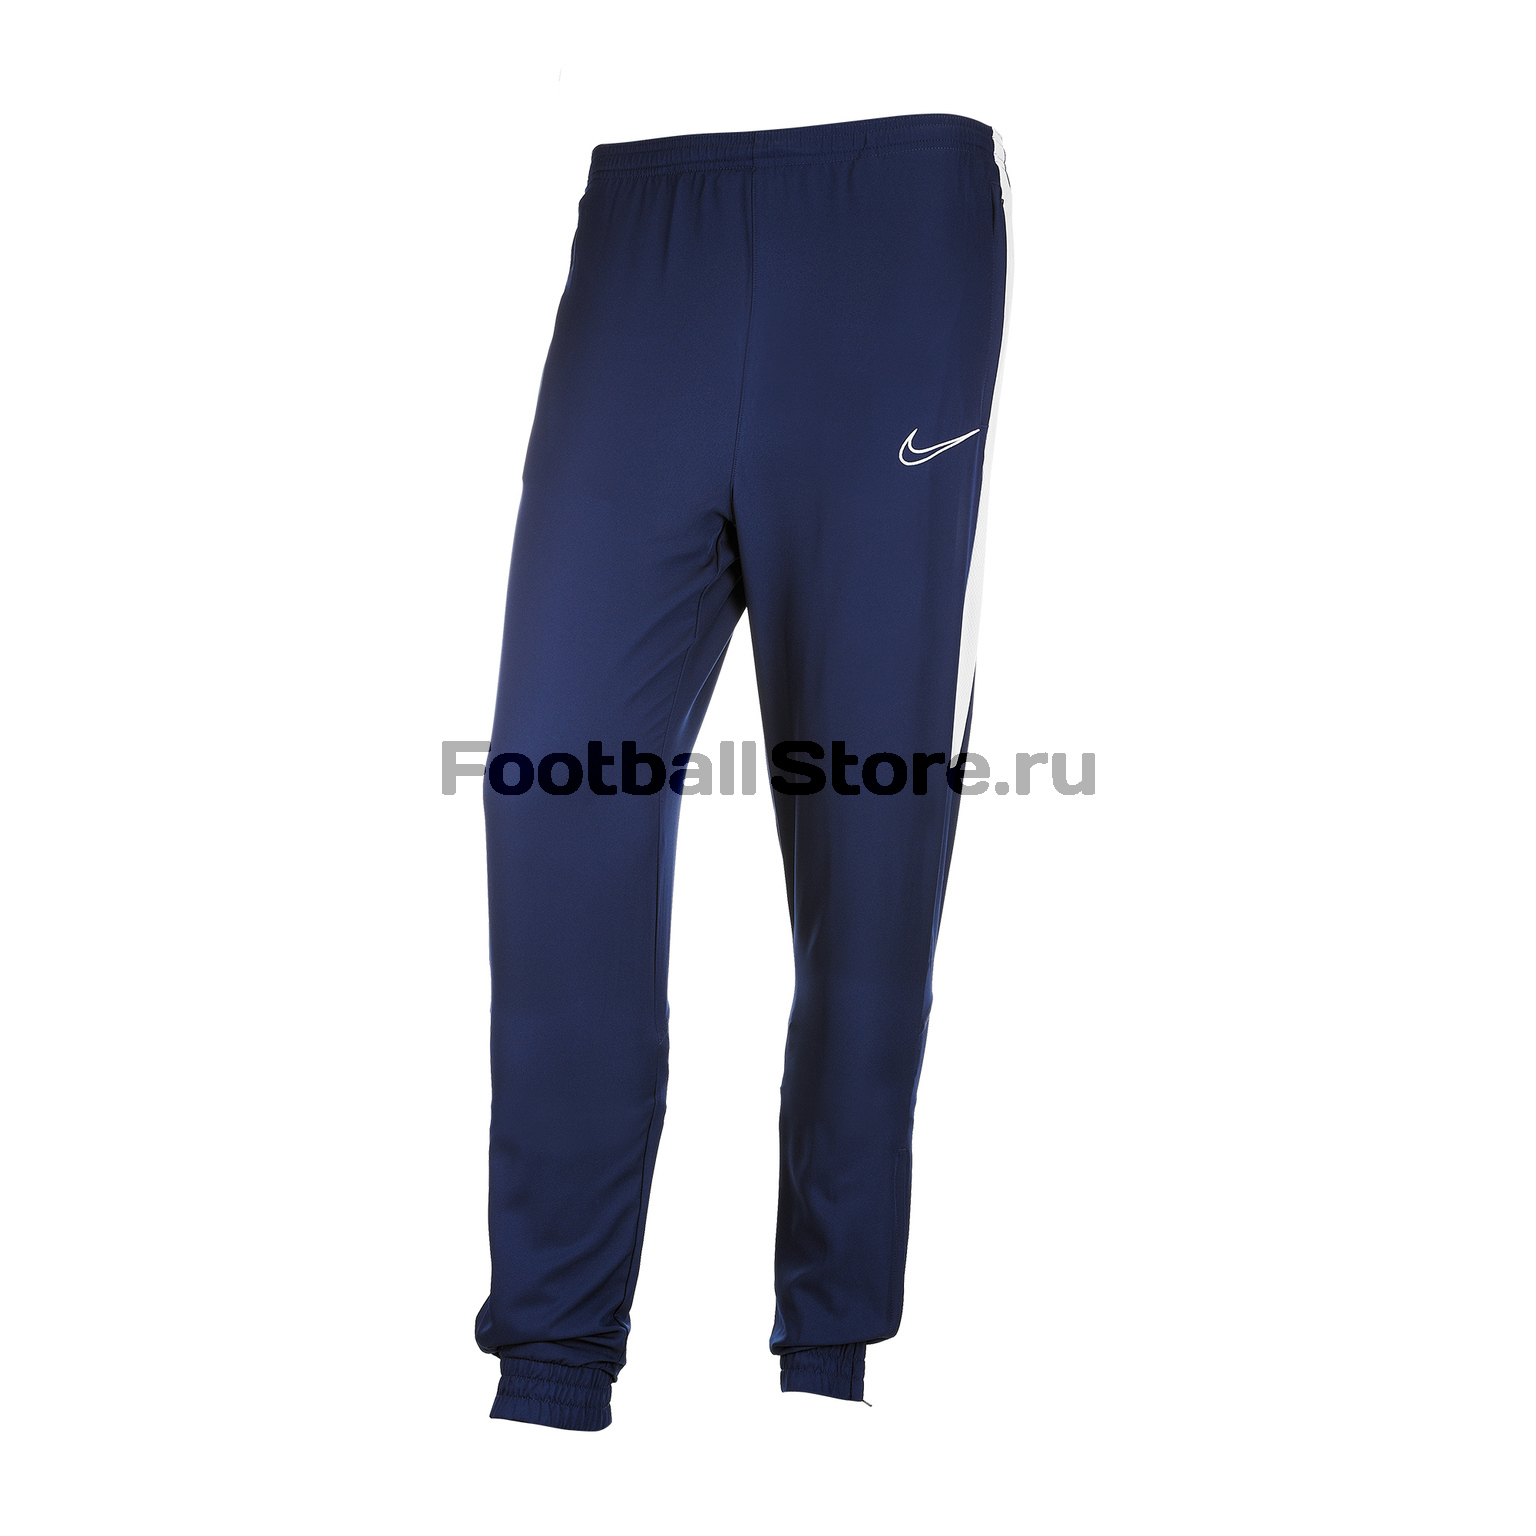 Брюки Nike Dry Academy19 BV5836-451 стоимость